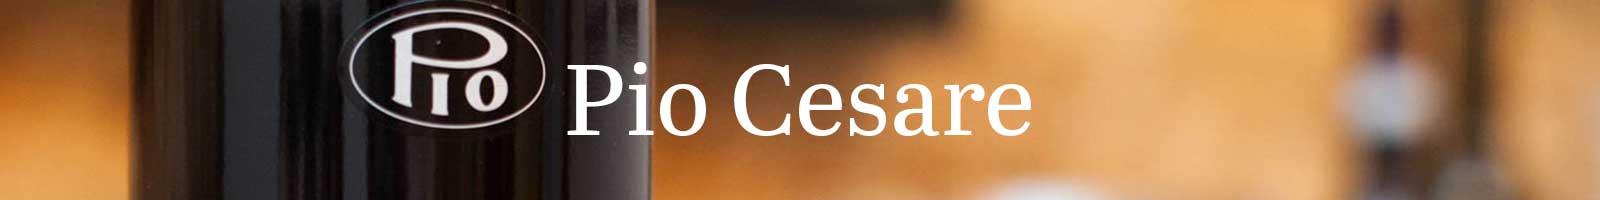 Essential Winemakers of Italy: Pio Cesare